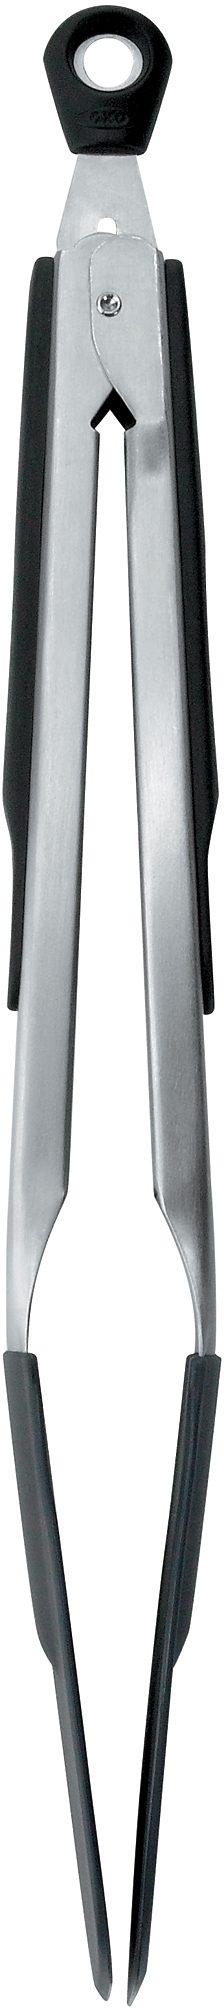 OXO Silikonzange, 30 cm